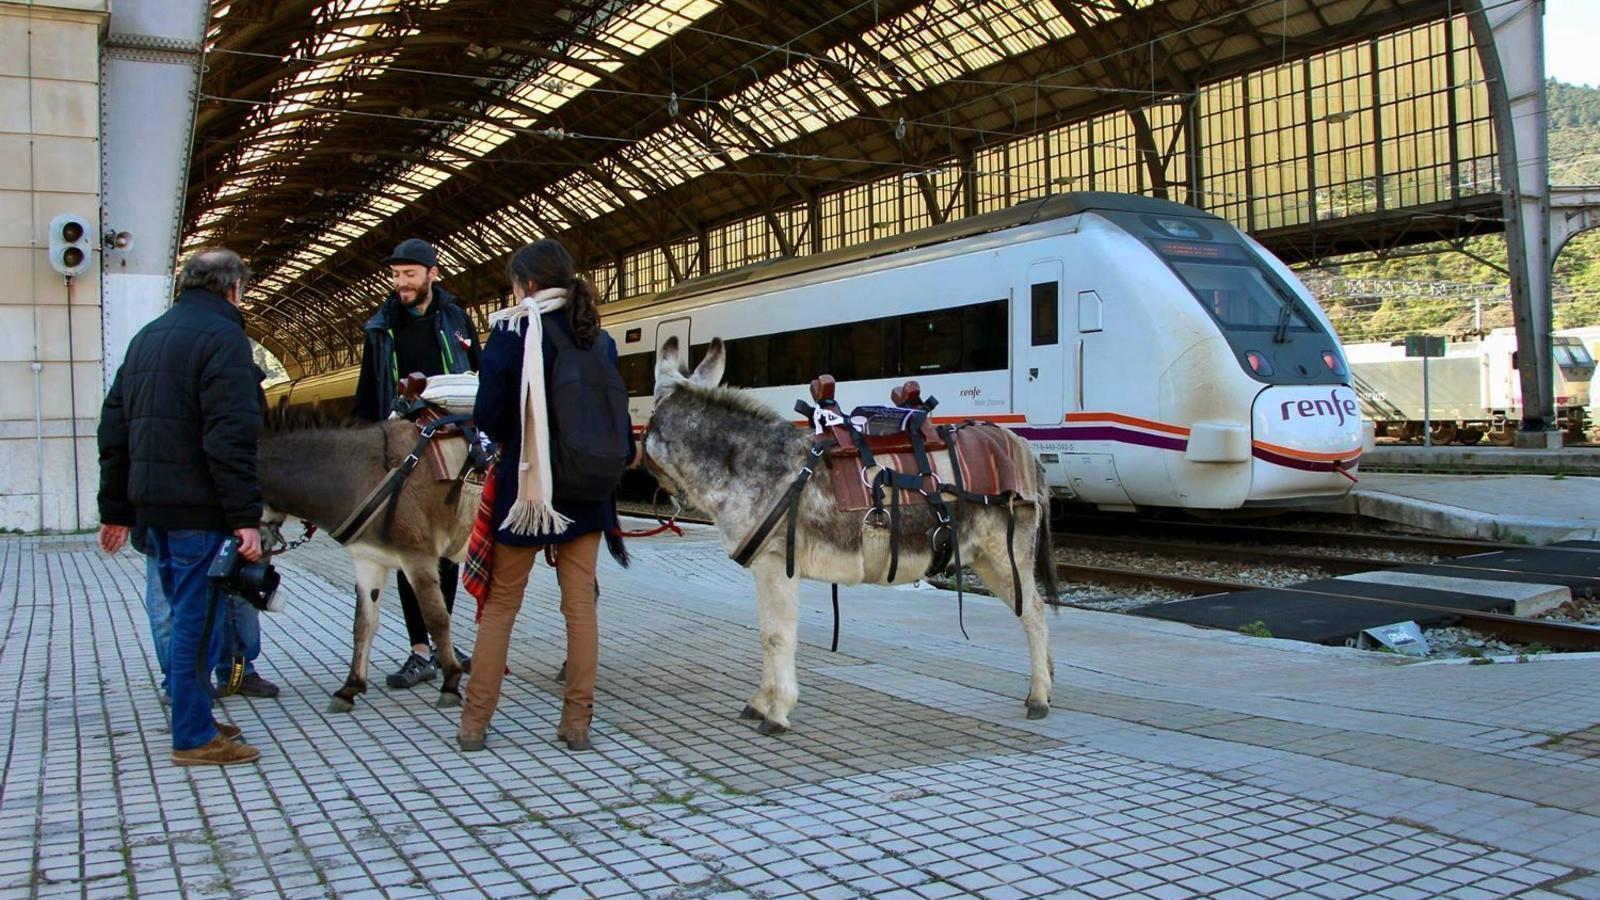 http://www.ara.cat/2017/03/02/comarquesgironines/territori-revolta-contra-desconnexions-ferroviaries_1751834814_39110118_1500x1001.jpg